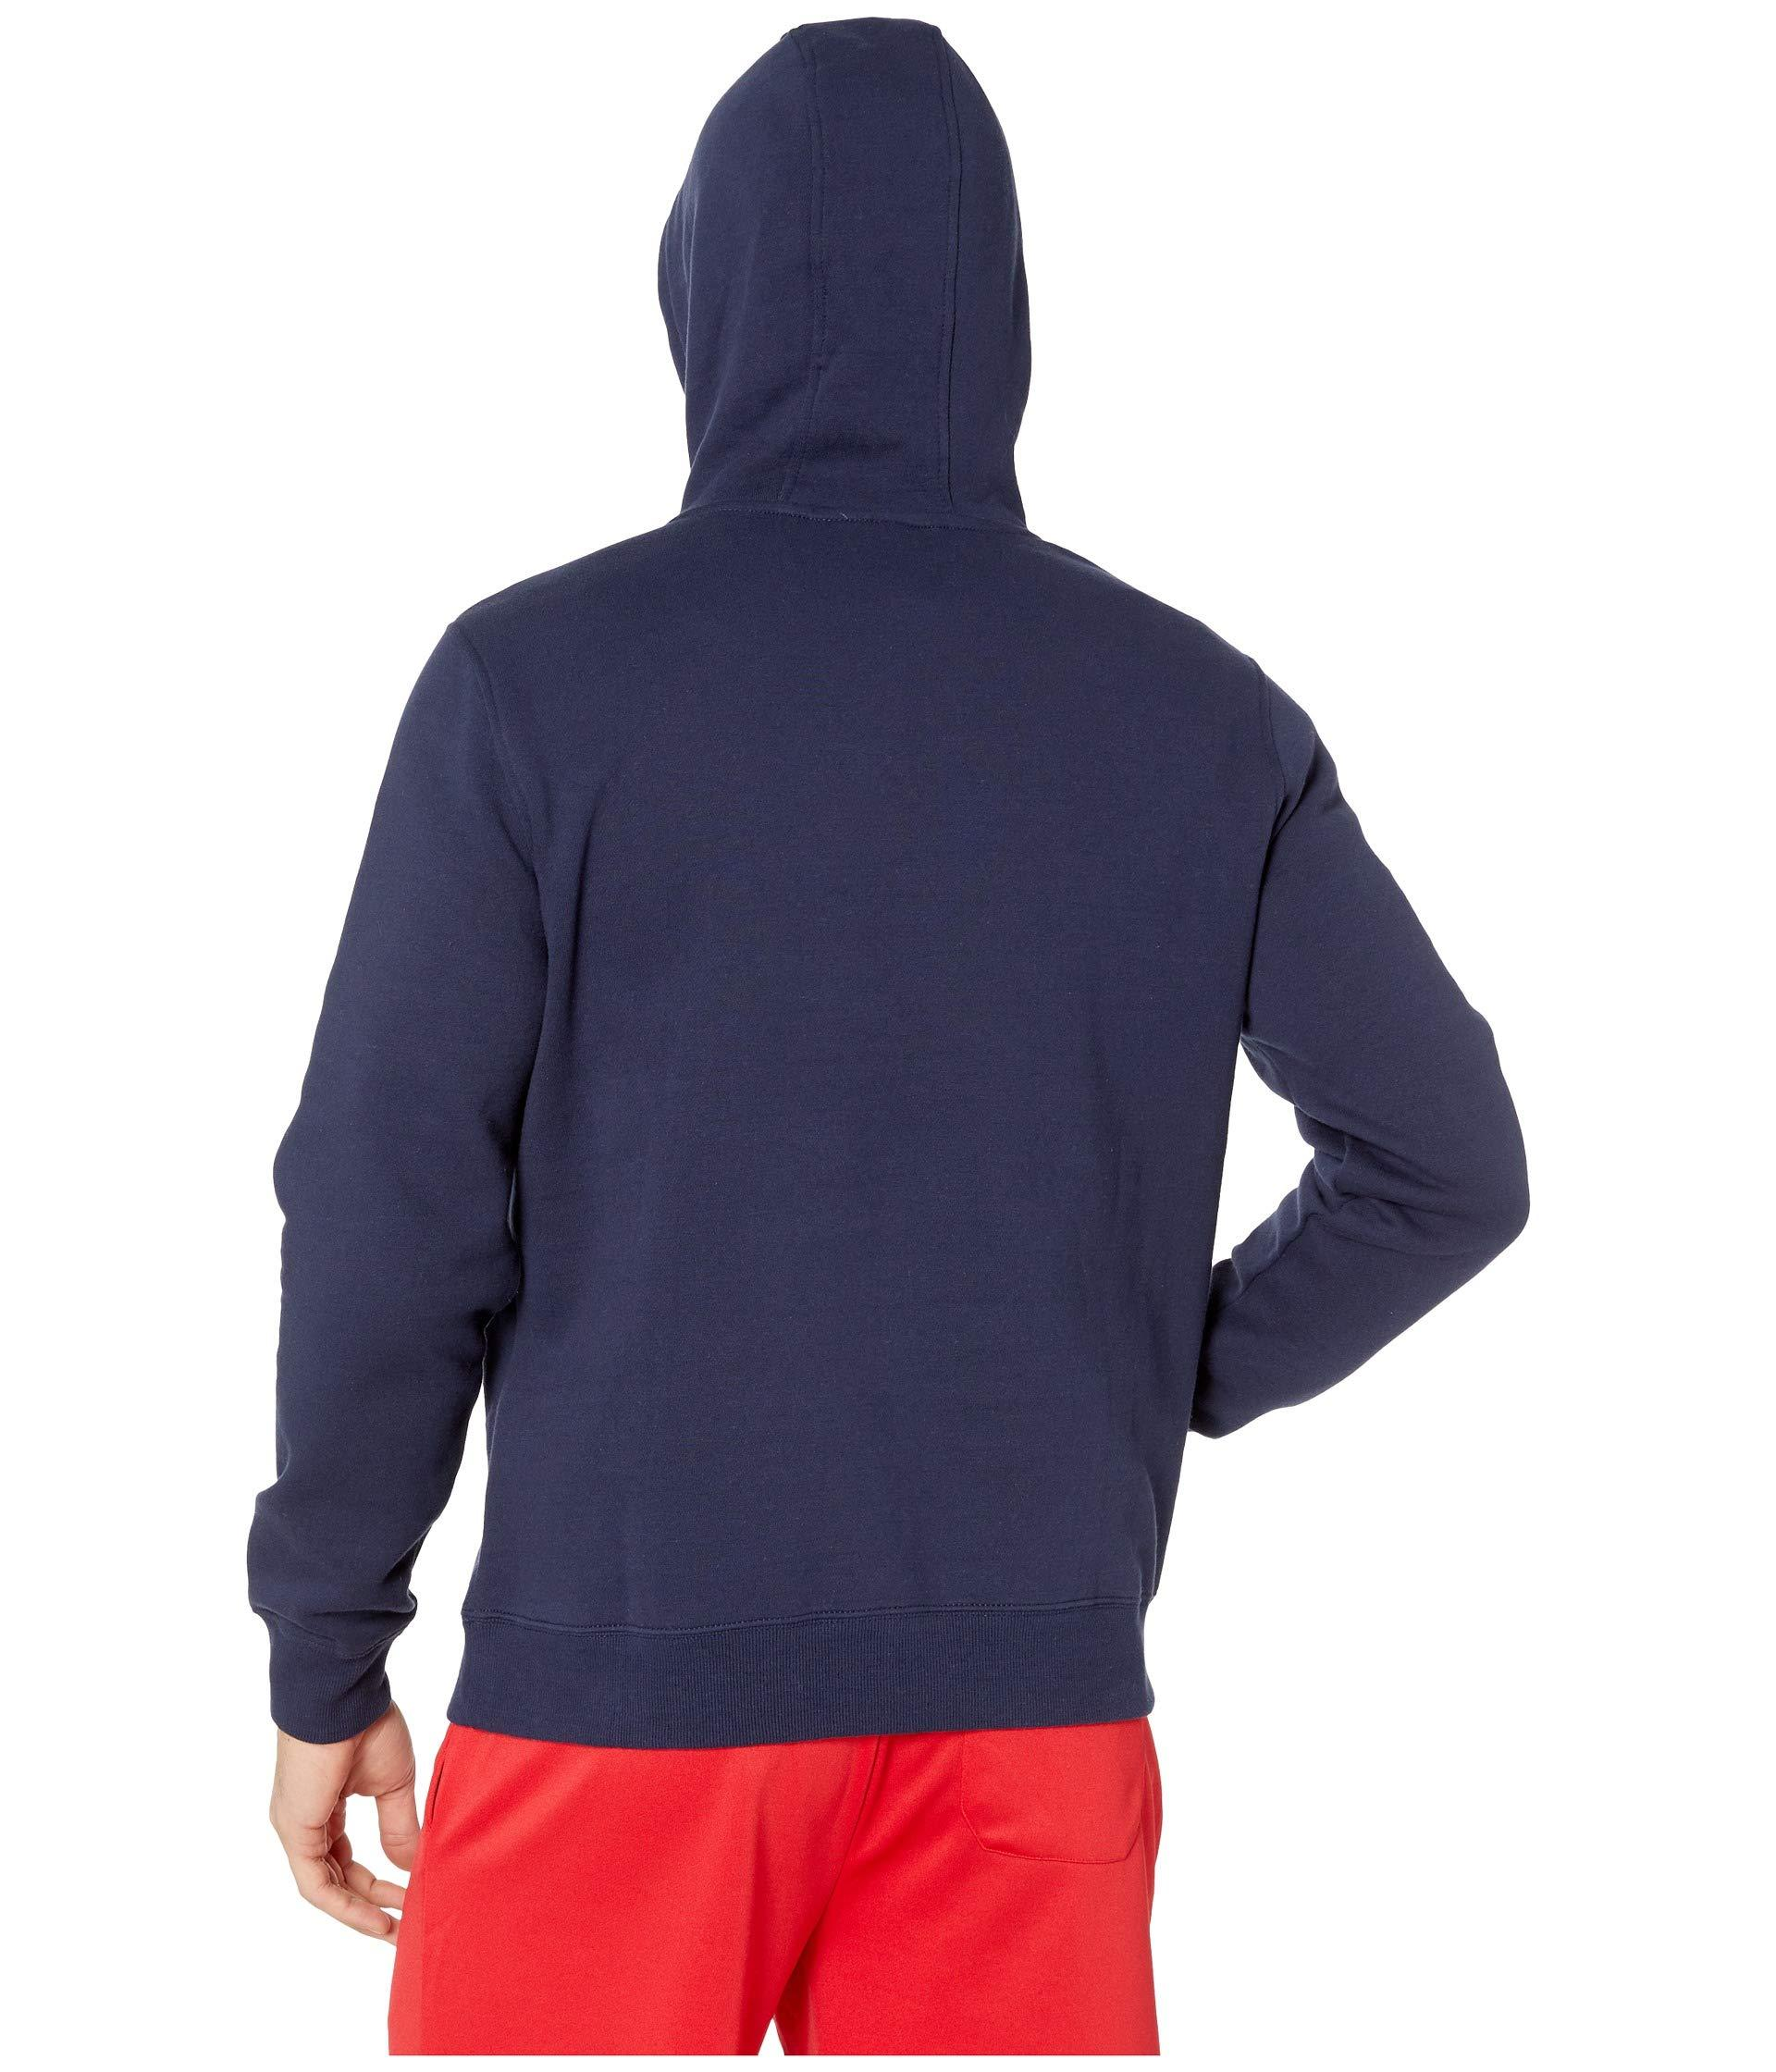 Lichenran Yellow Purple Blue Red Men 3D Print Pullover Hoodie Sweatshirt with Front Pocket